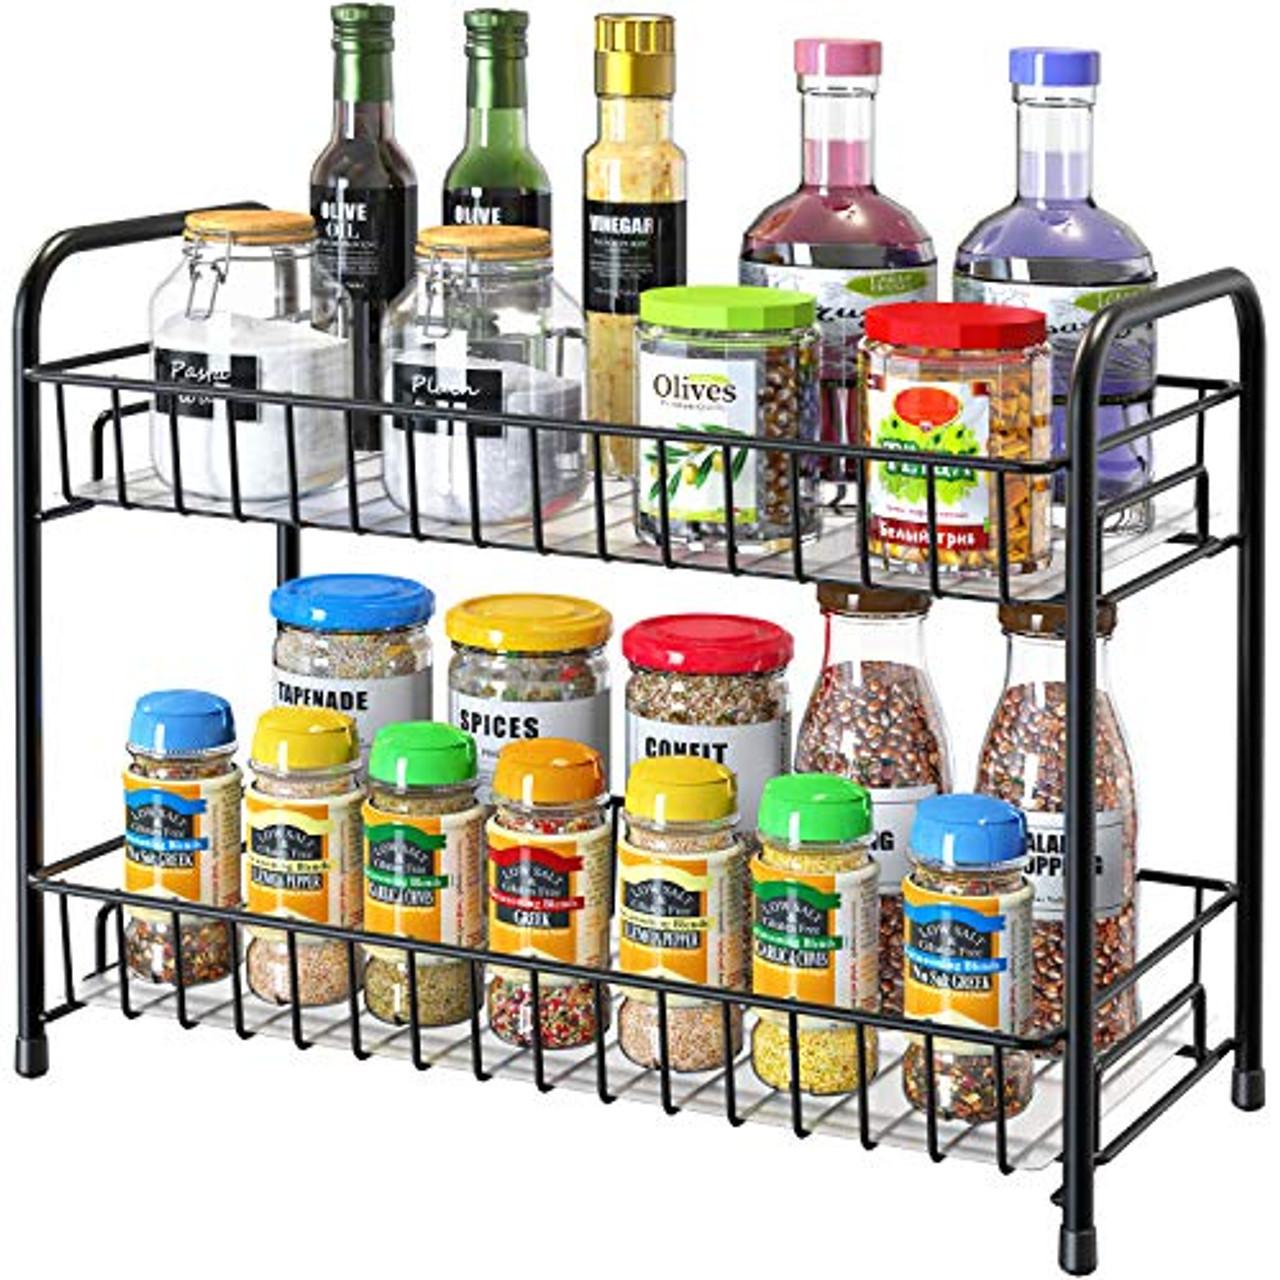 2-Tier Kitchen Countertop Spice Rack Organizer Cabinet Shelves Holder Black